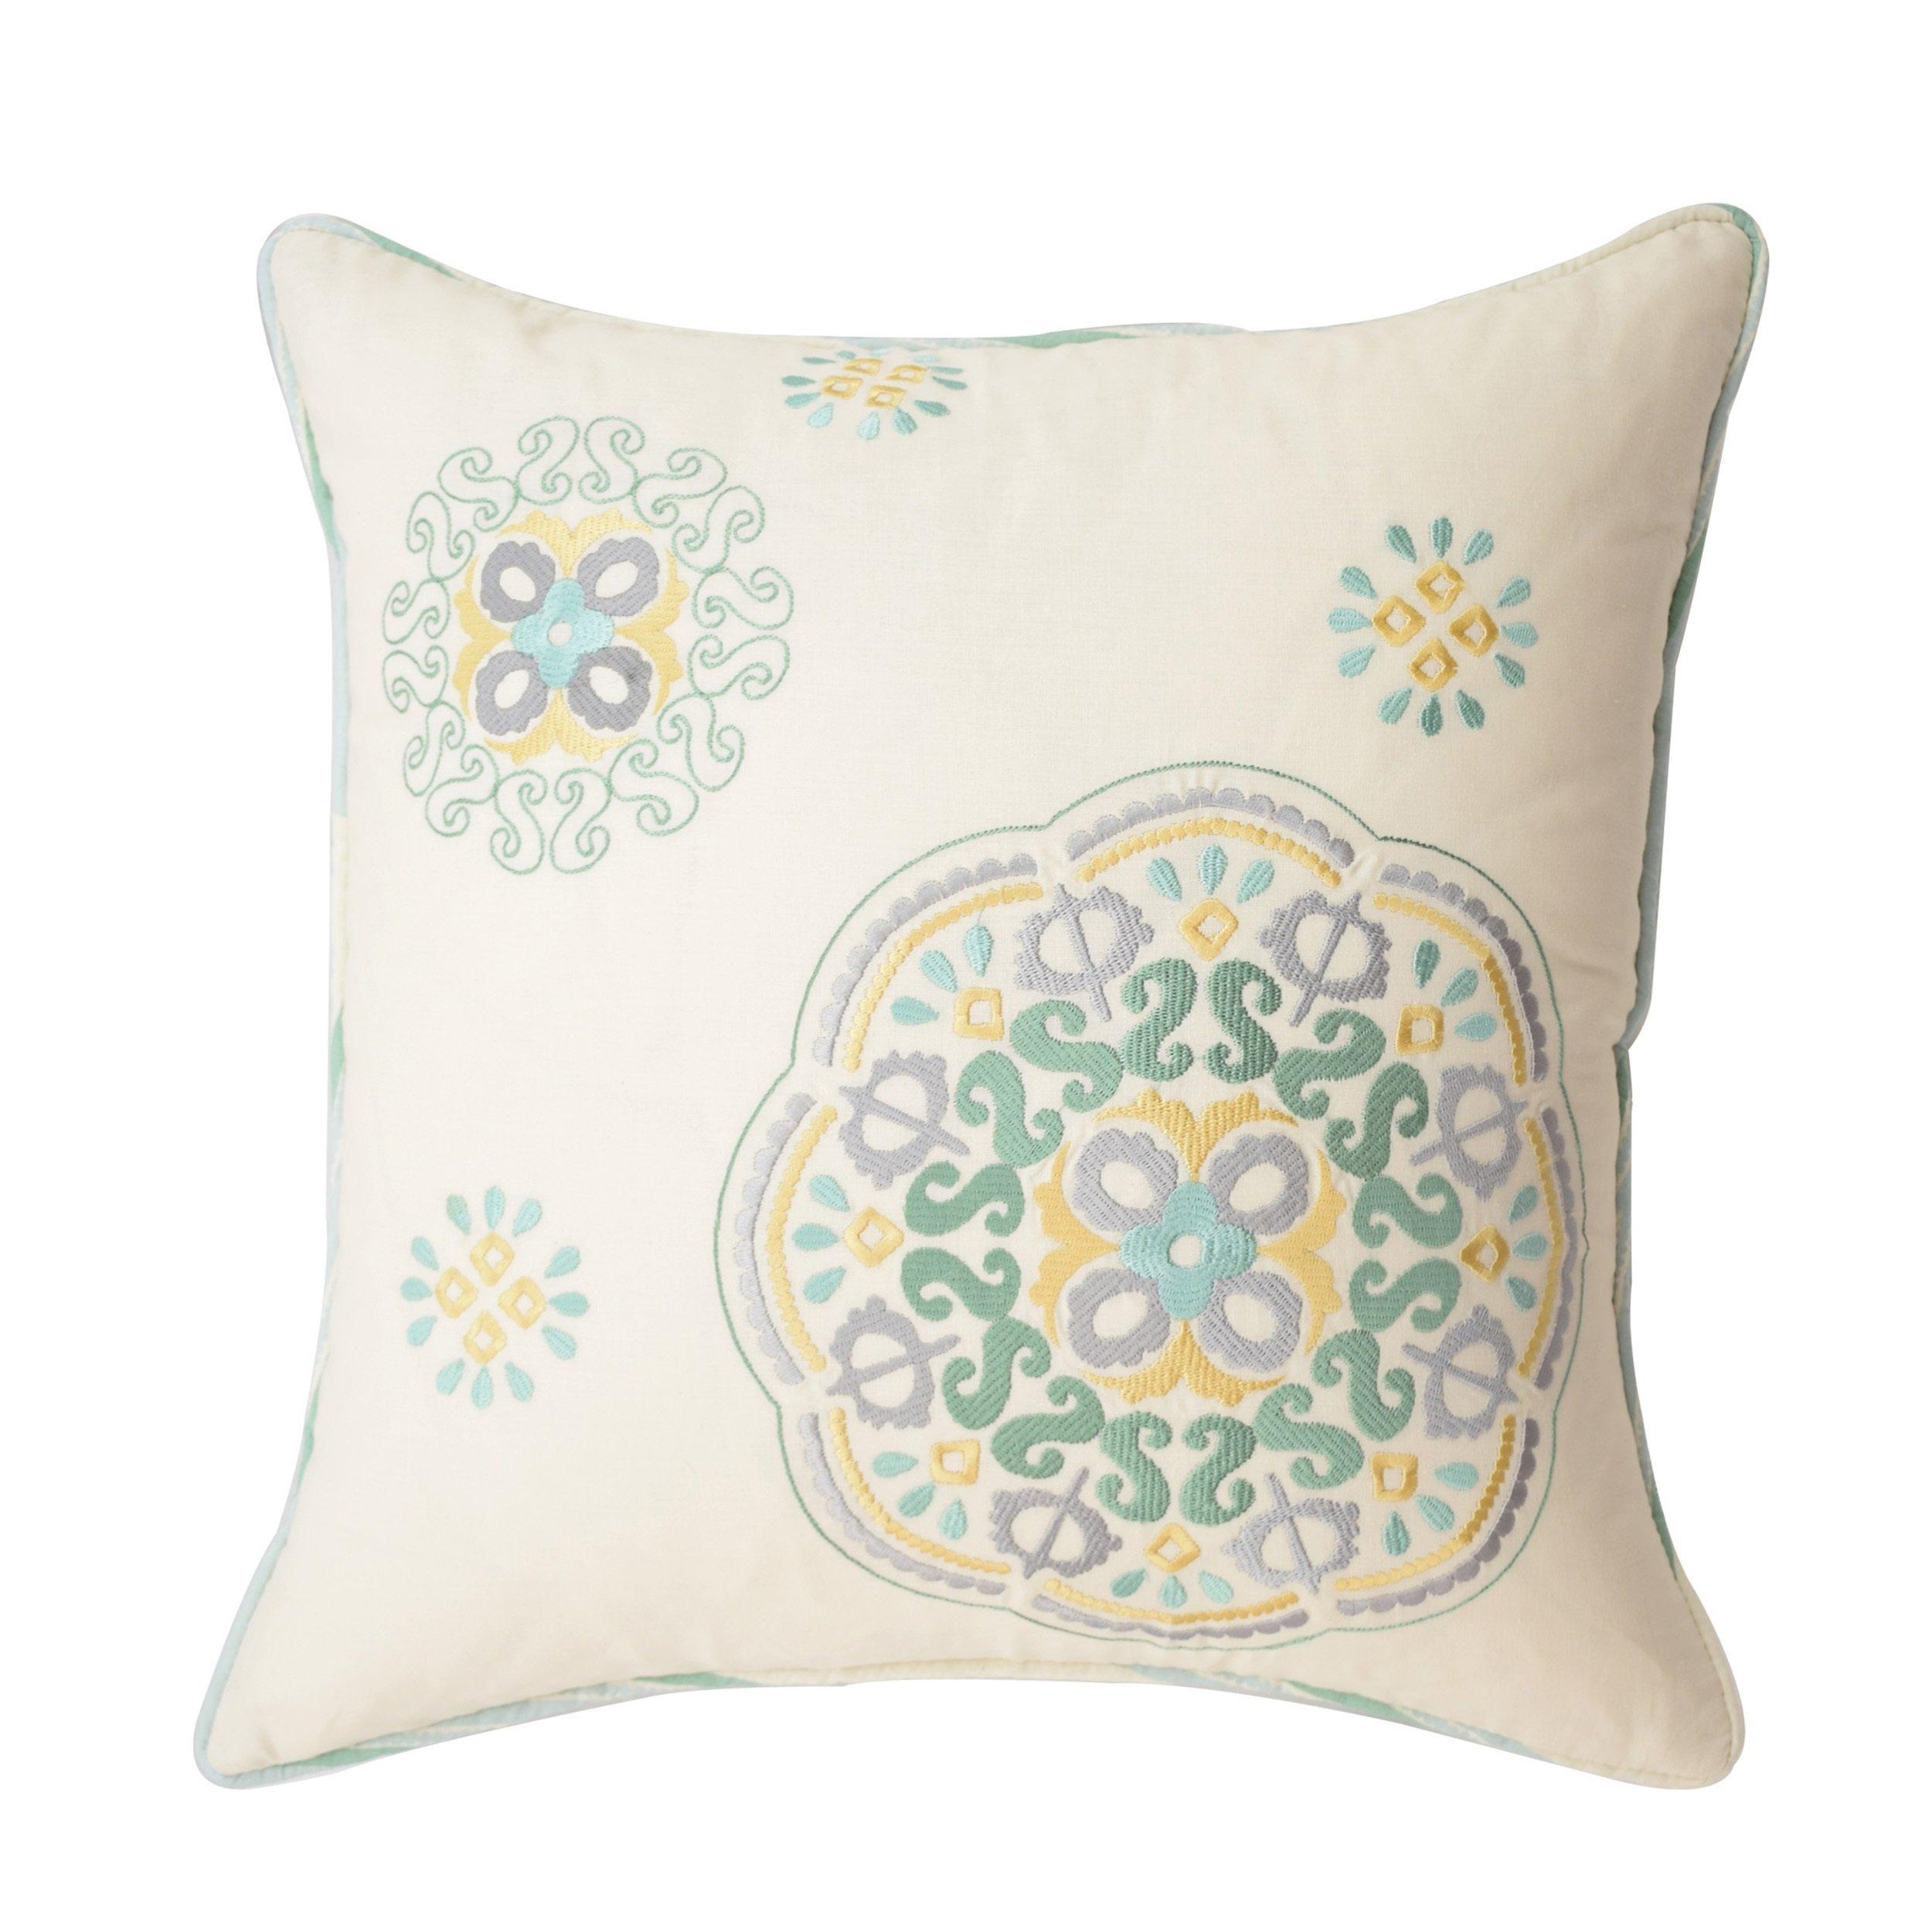 WAVERLY Astrid Decorative Pillow, 16x16, Mineral